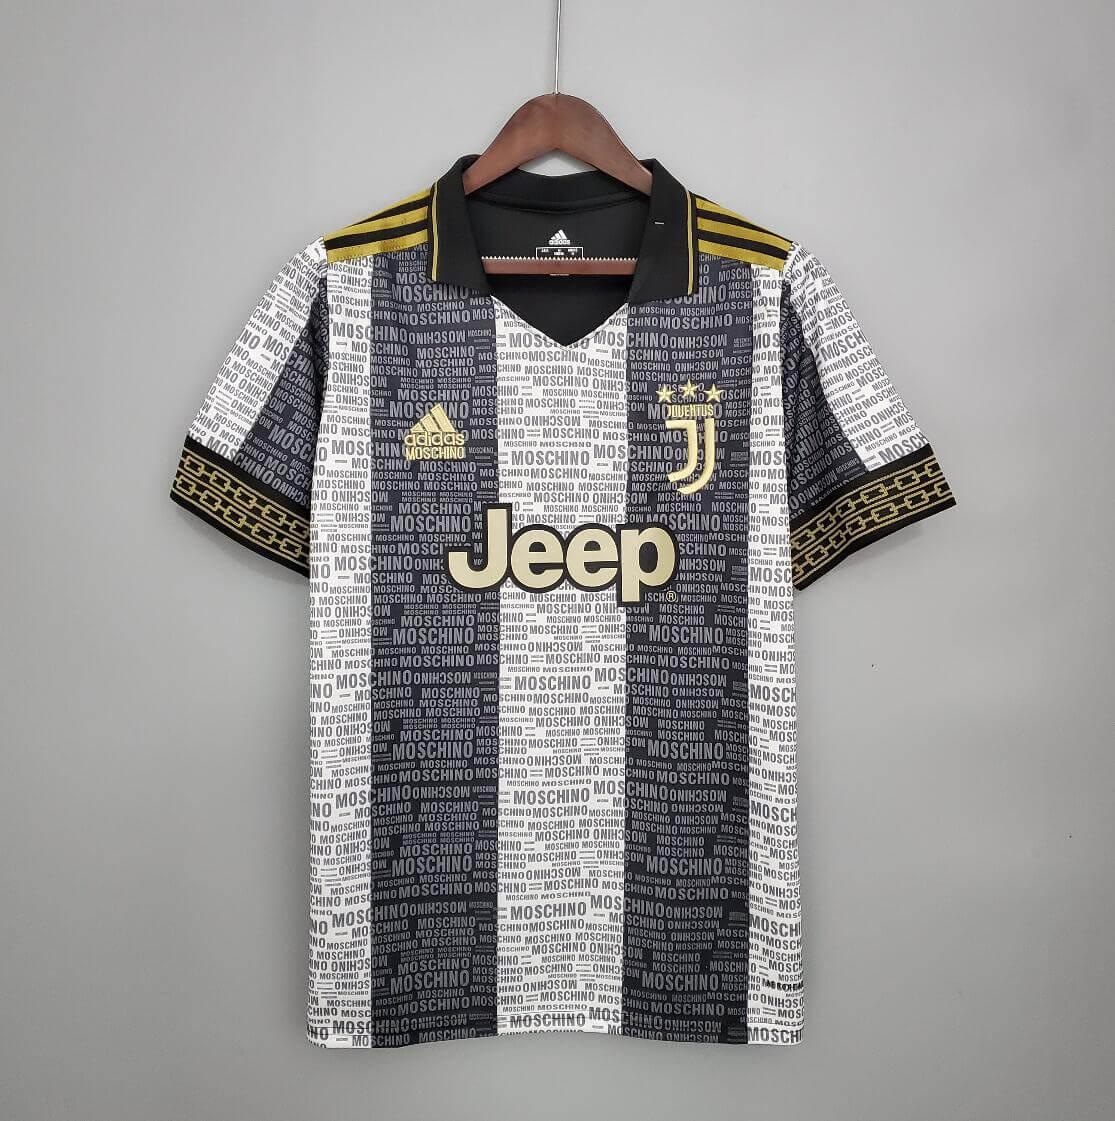 Camisetas 21/22 Juventus Vs Adidas & Moschino Concept Design